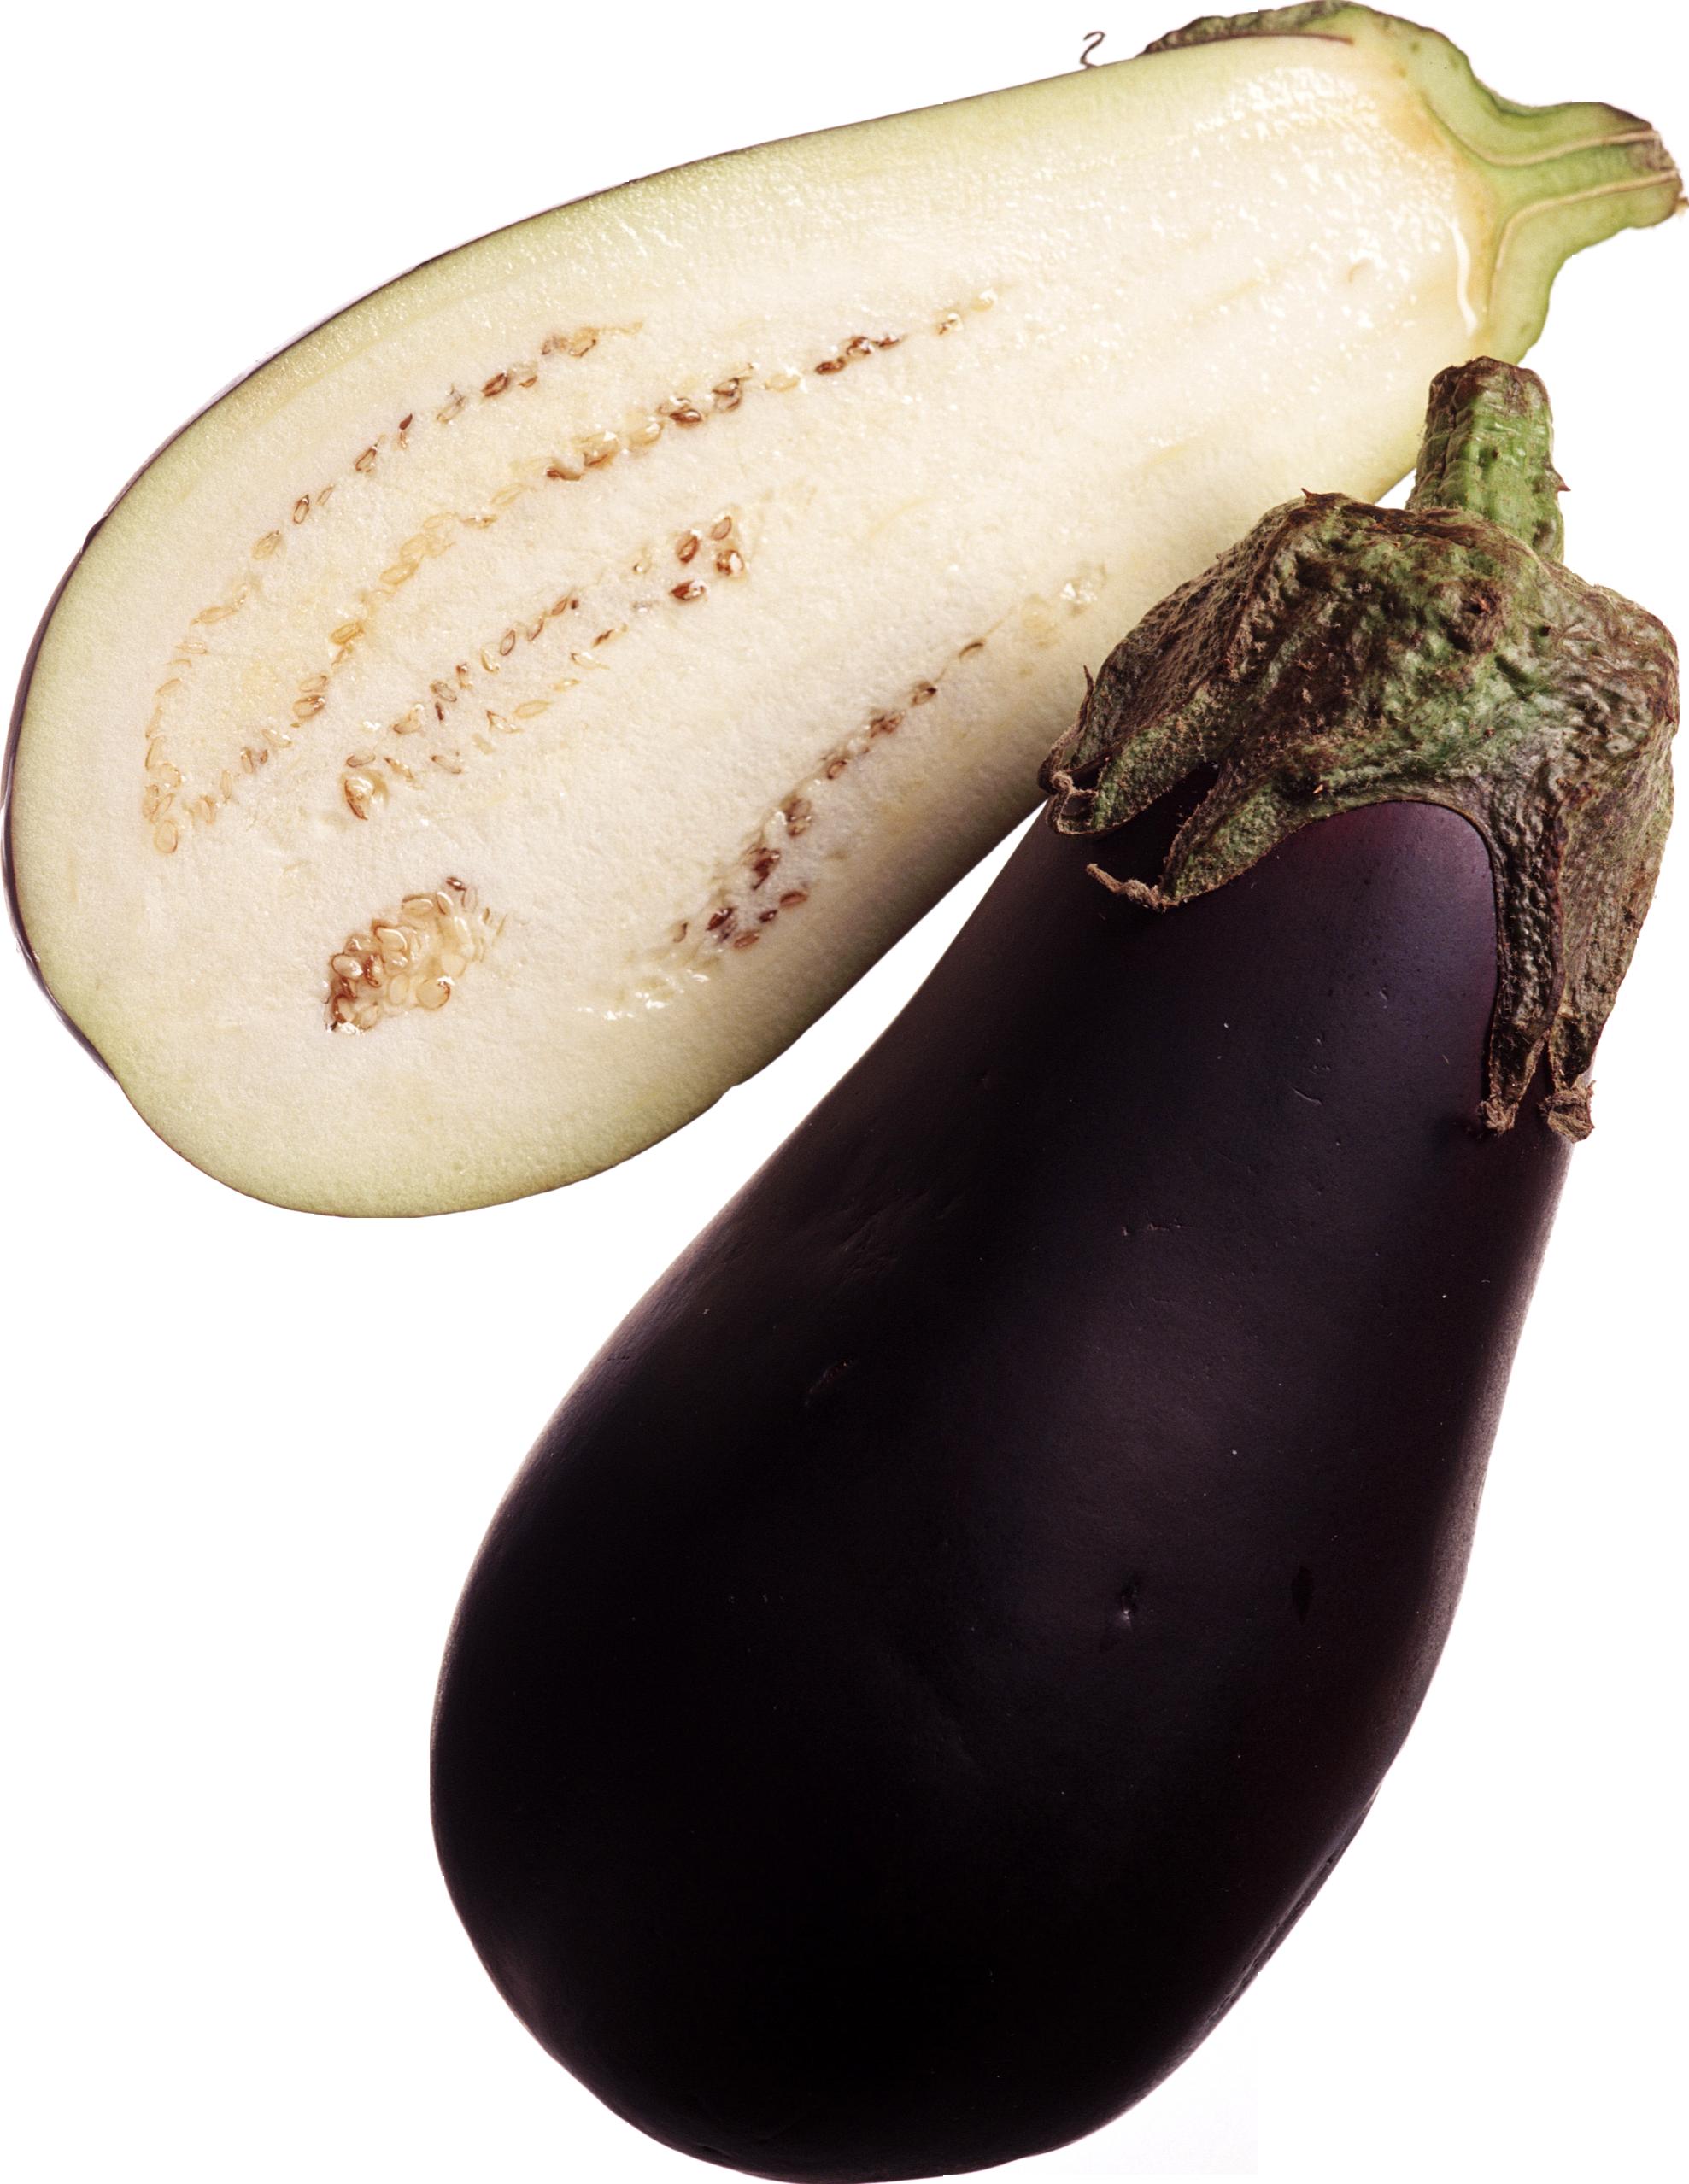 Eggplant PNG images free download - Eggplant PNG